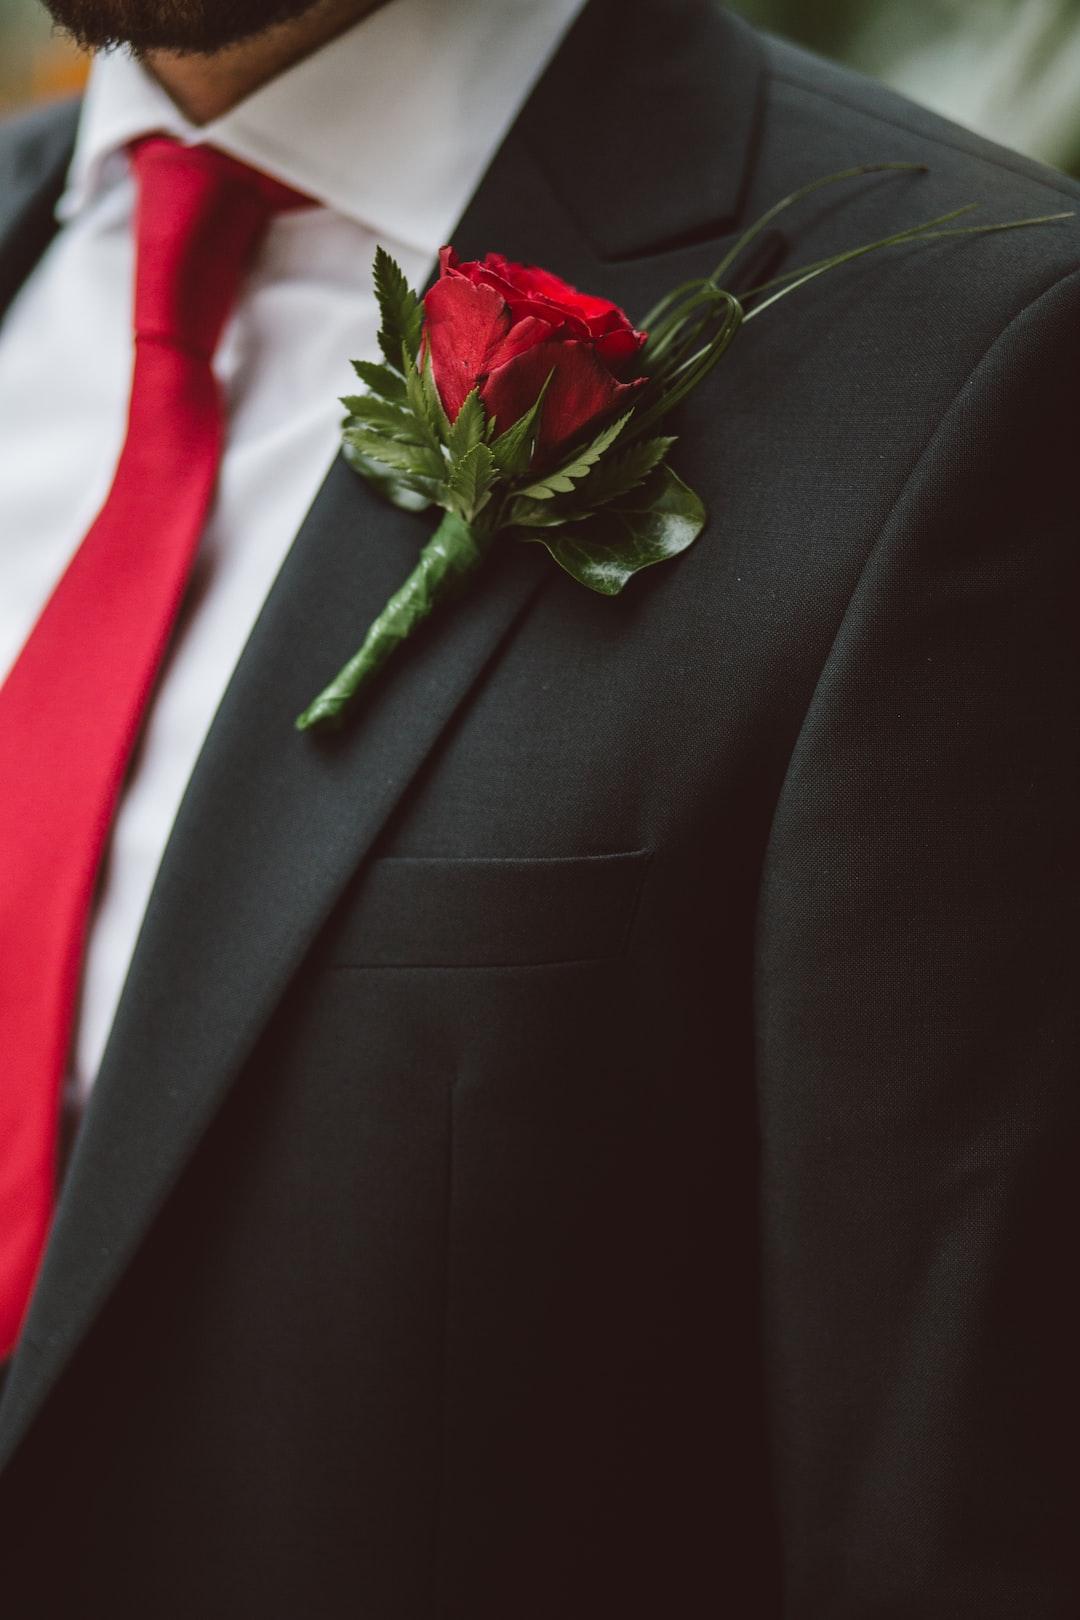 Groom wearing a red flower